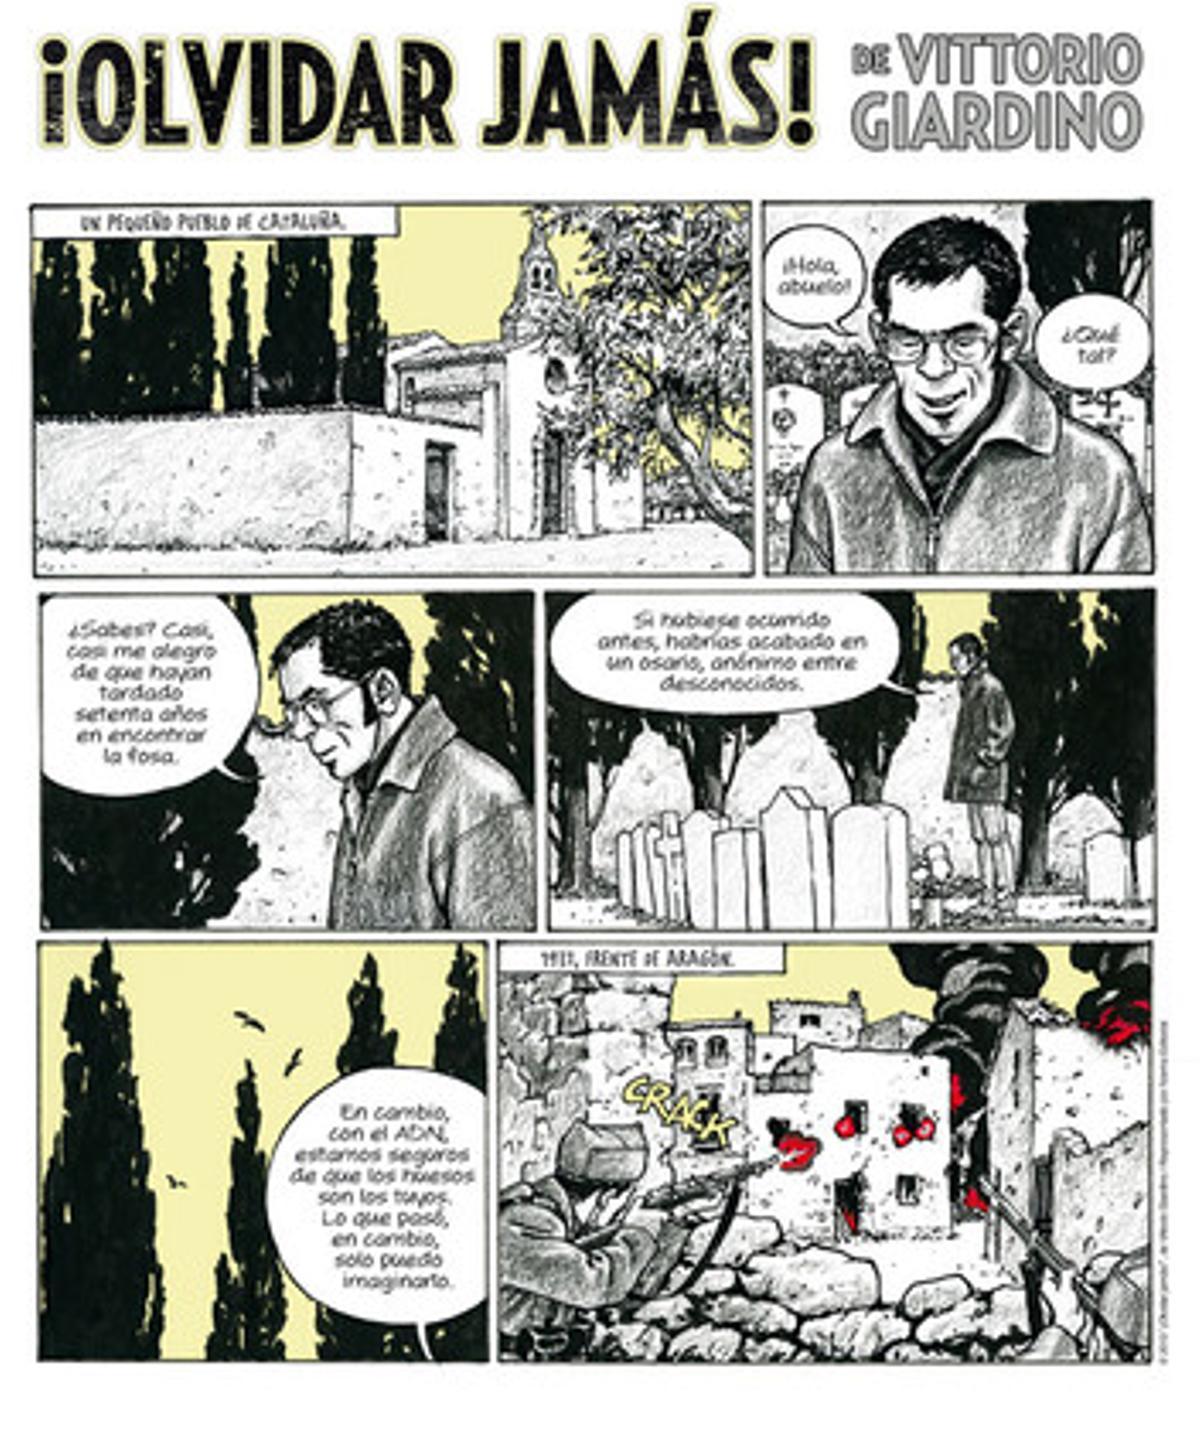 El còmic según la visión de Vittorio Giardino.